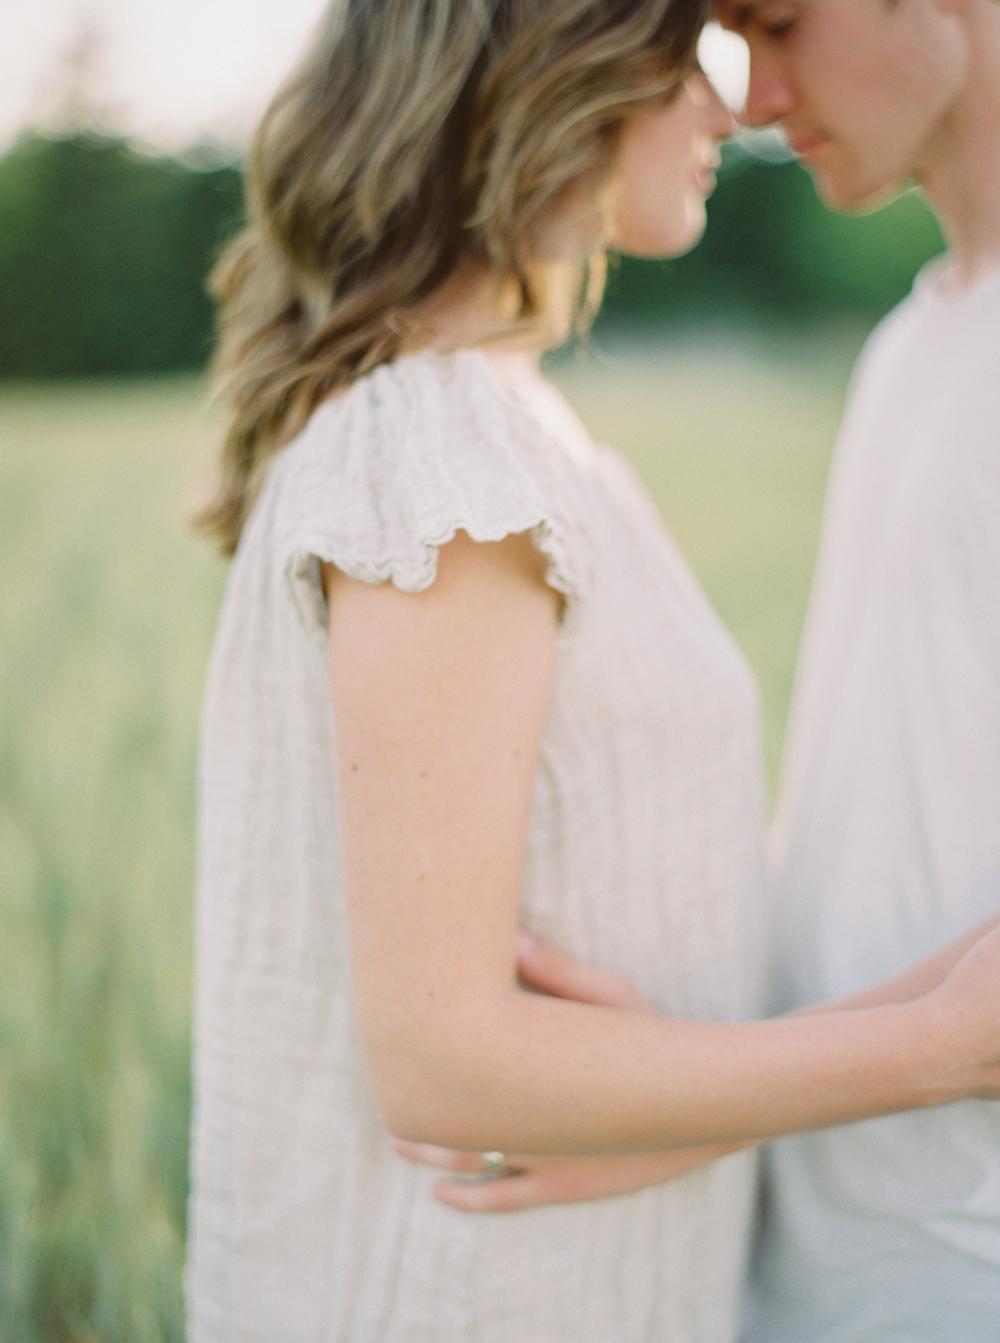 Niagara Wedding Photographer - Websters Falls Engagement